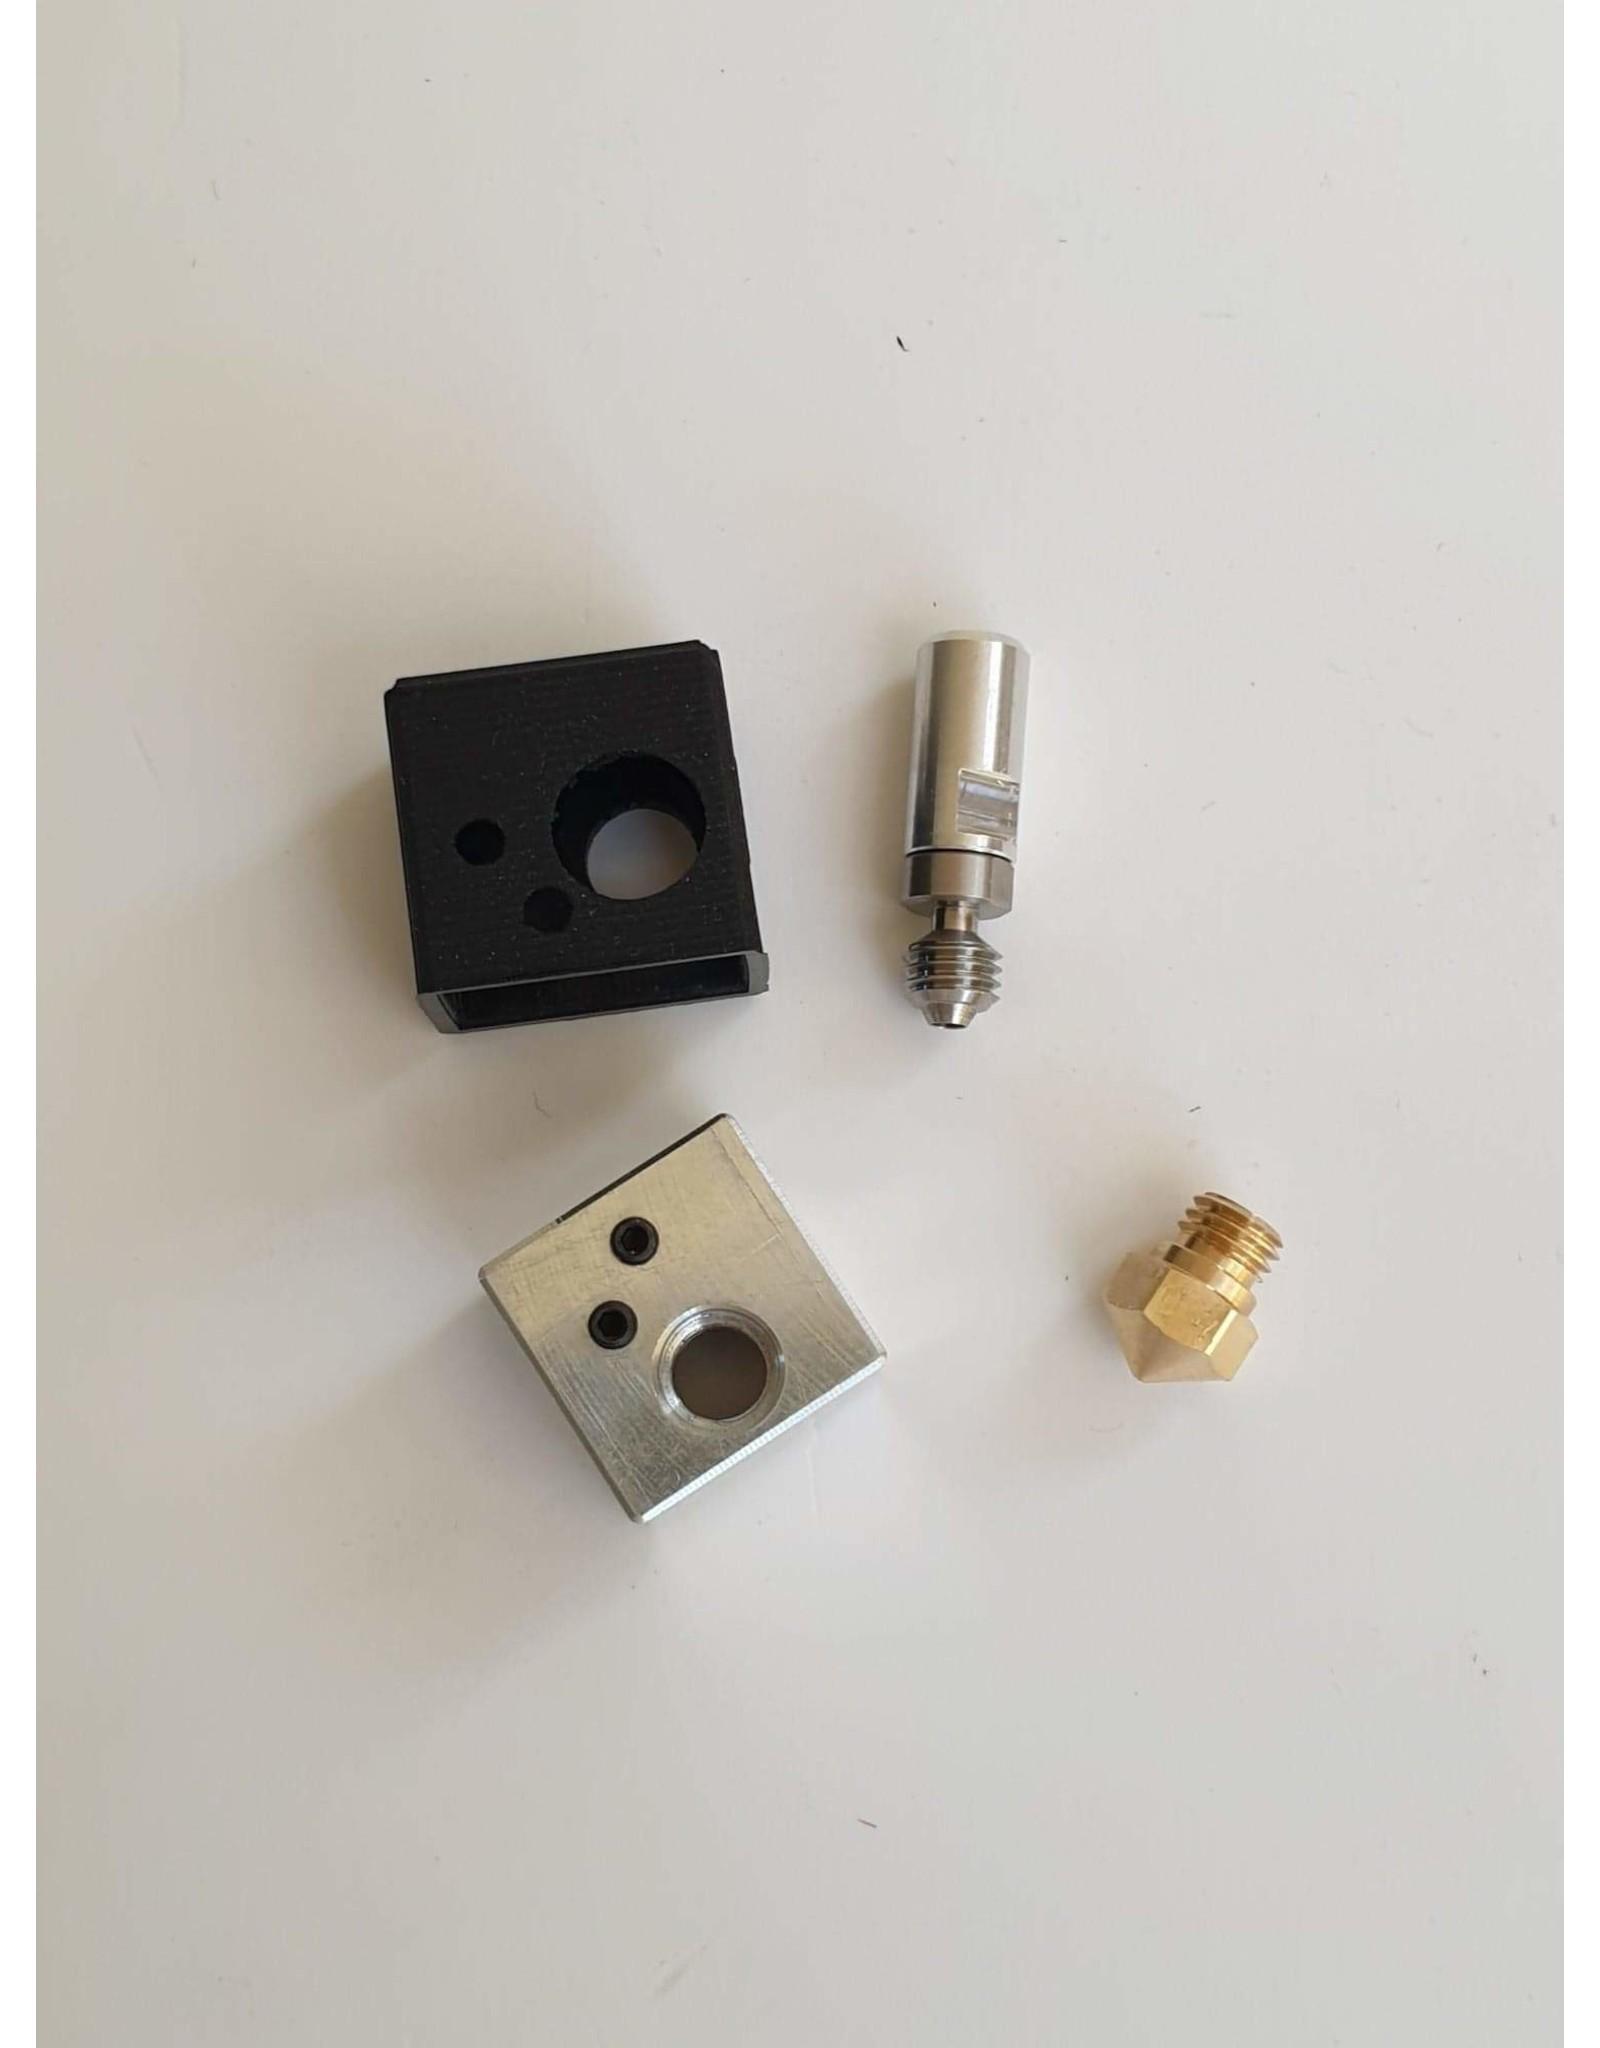 Wanhao Hotend tout métal pour Wanhao D9 / I3PLUS MKII / GR2